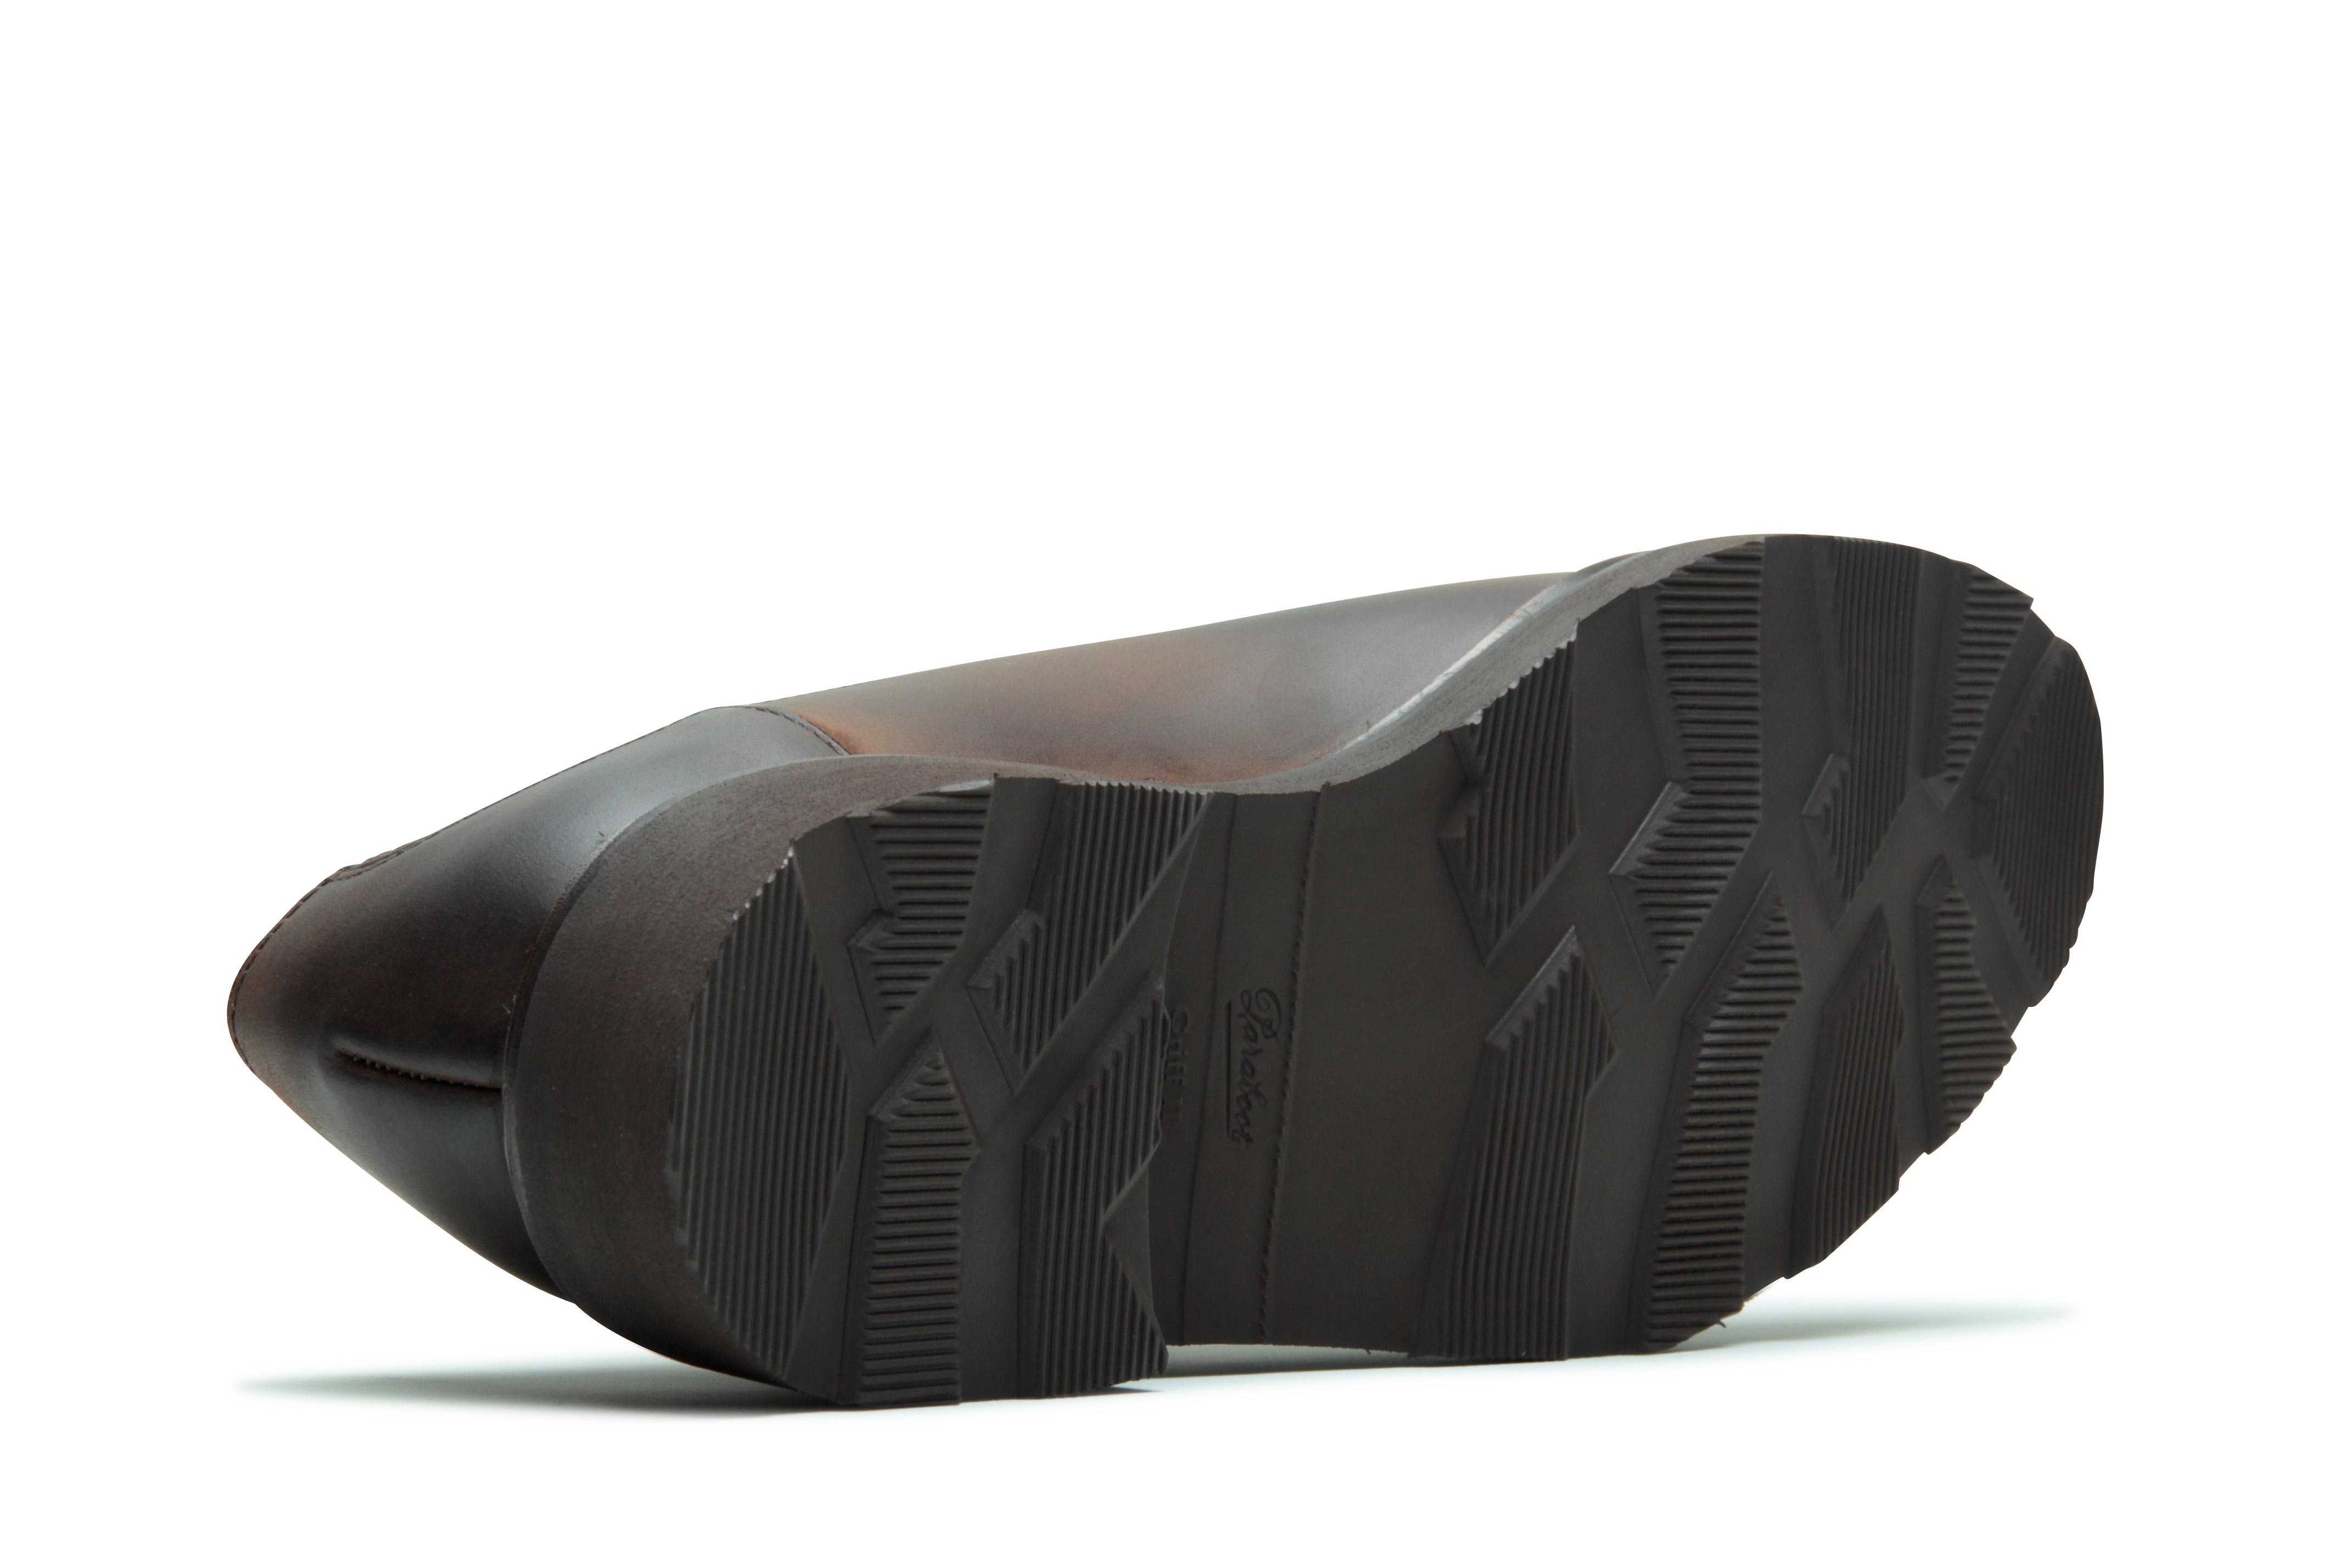 PARABOOT chaussure homme mod 705108 AVIGNONGRIFF II marron